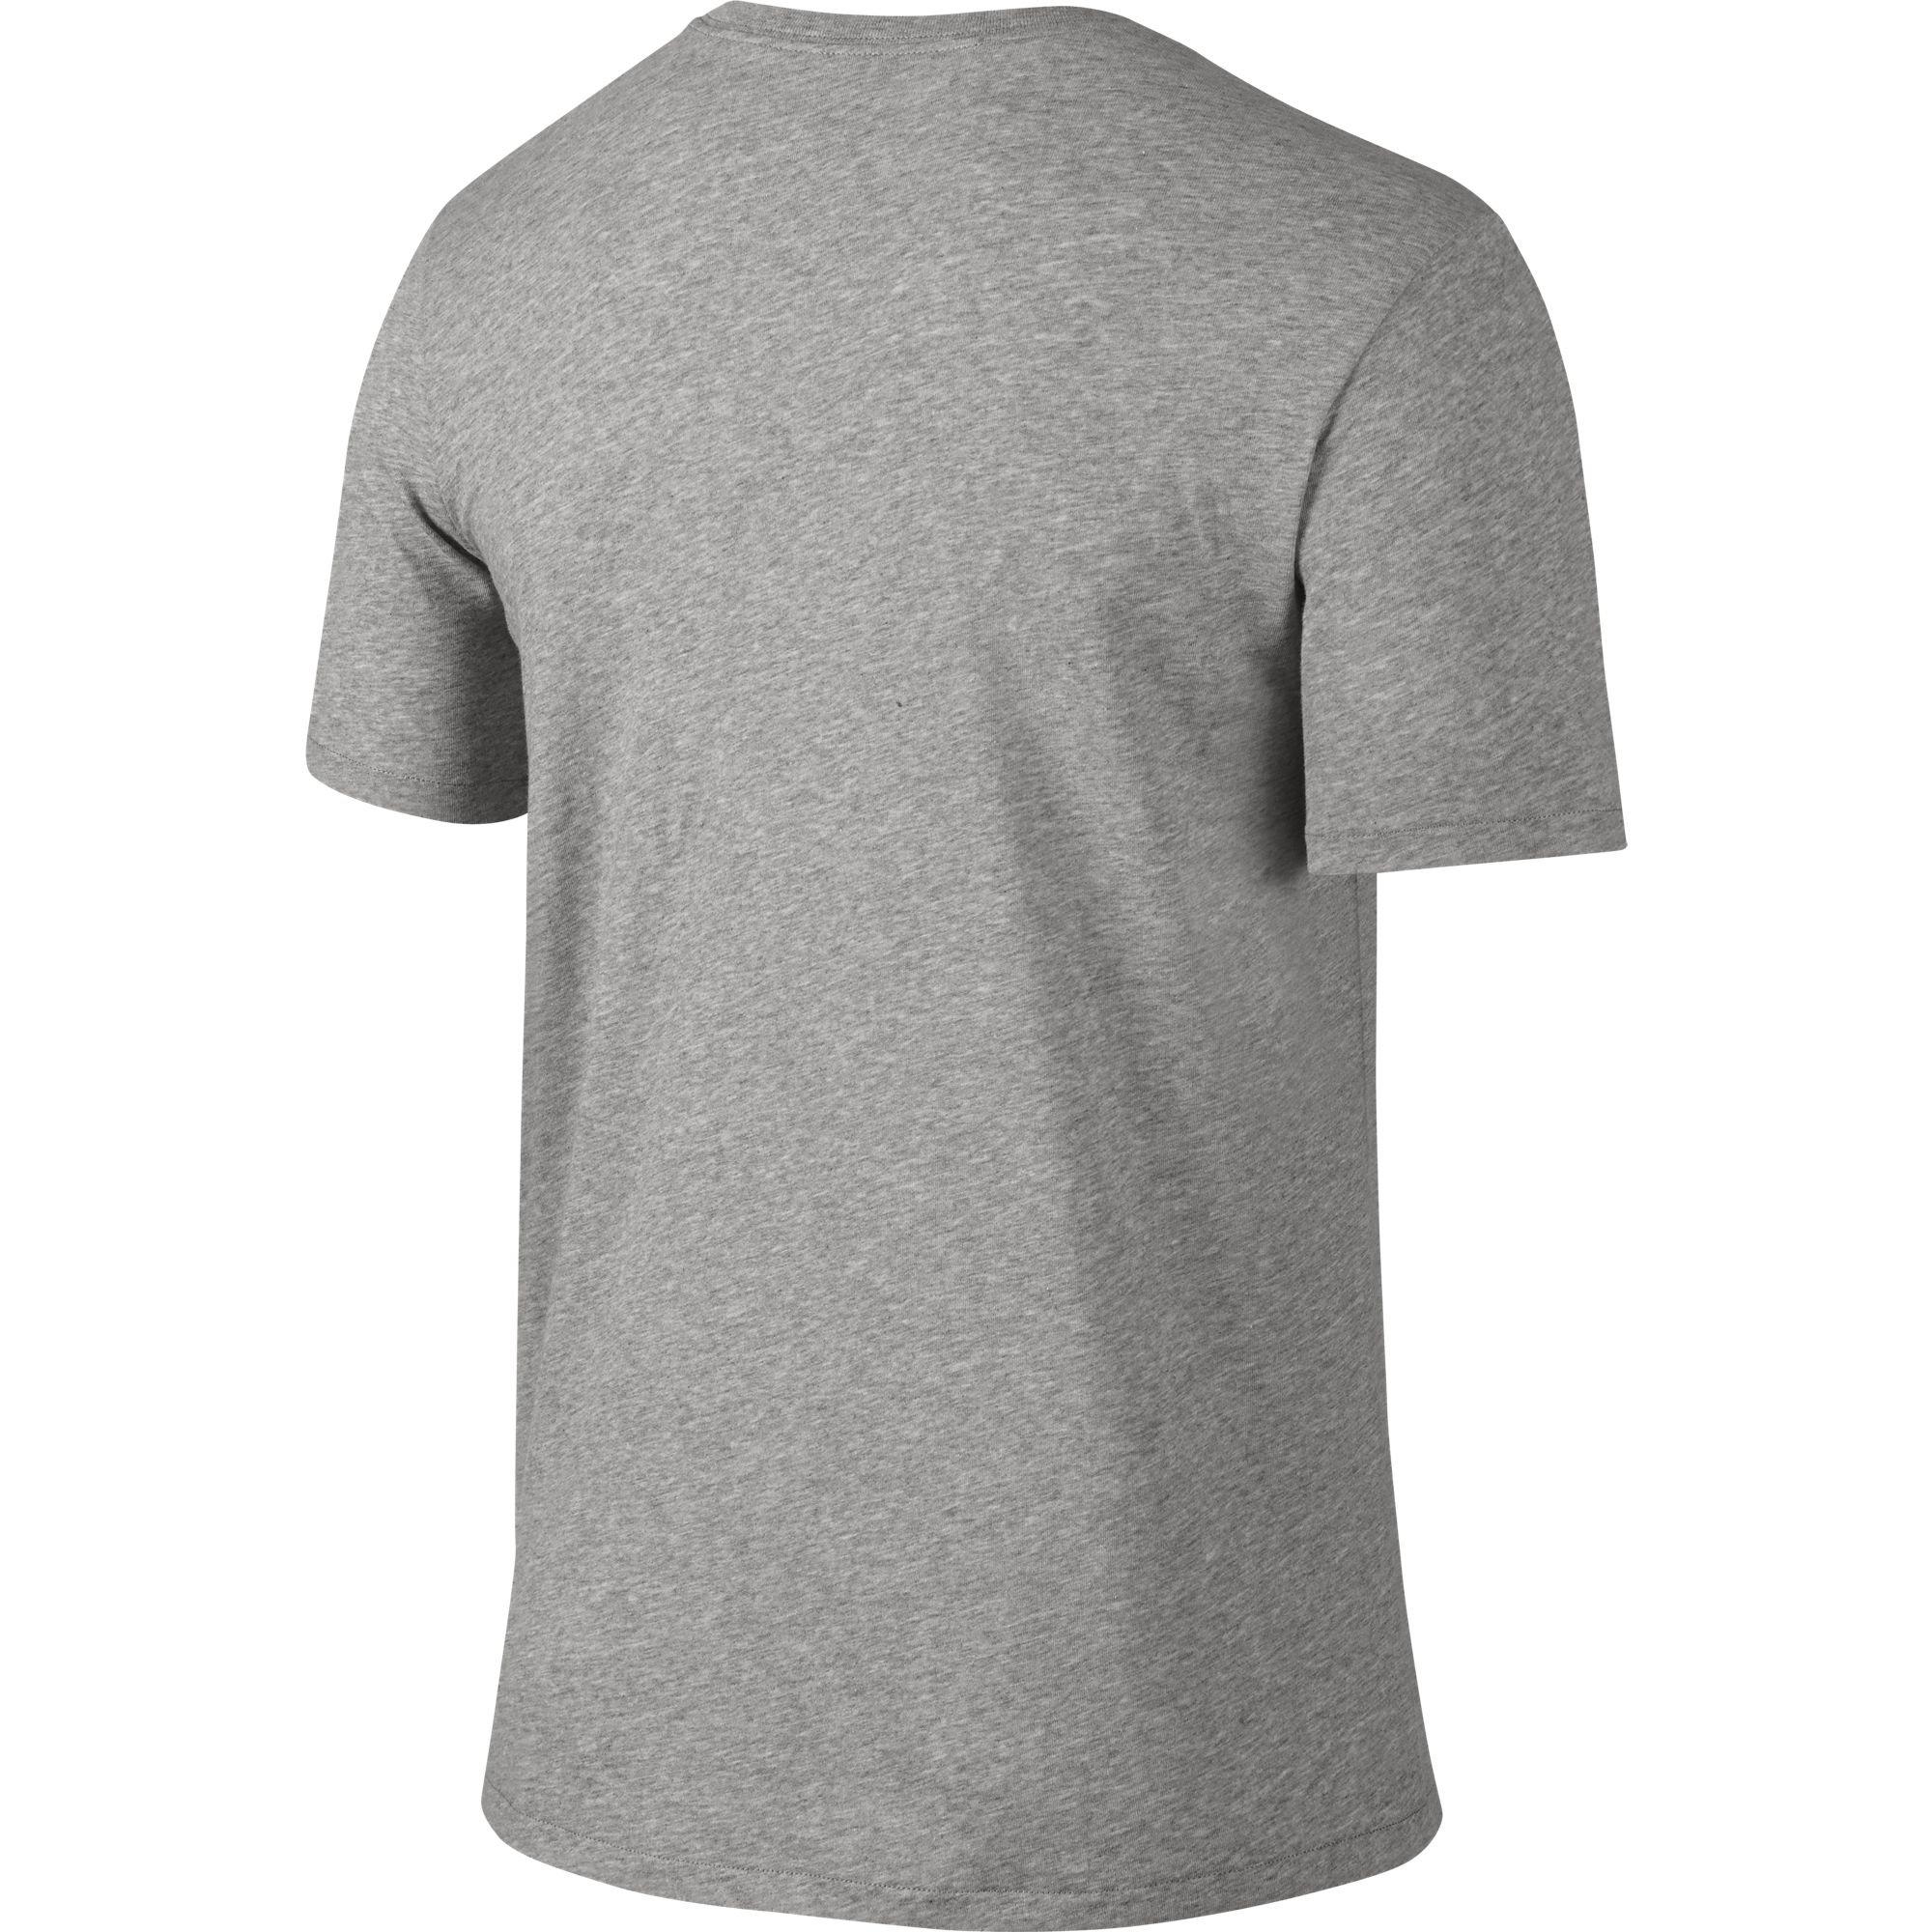 NIKE Men's Dri-FIT Cotton 2.0 Tee, Dark Grey Heather/Dark Grey Heather/Black, Small by Nike (Image #2)